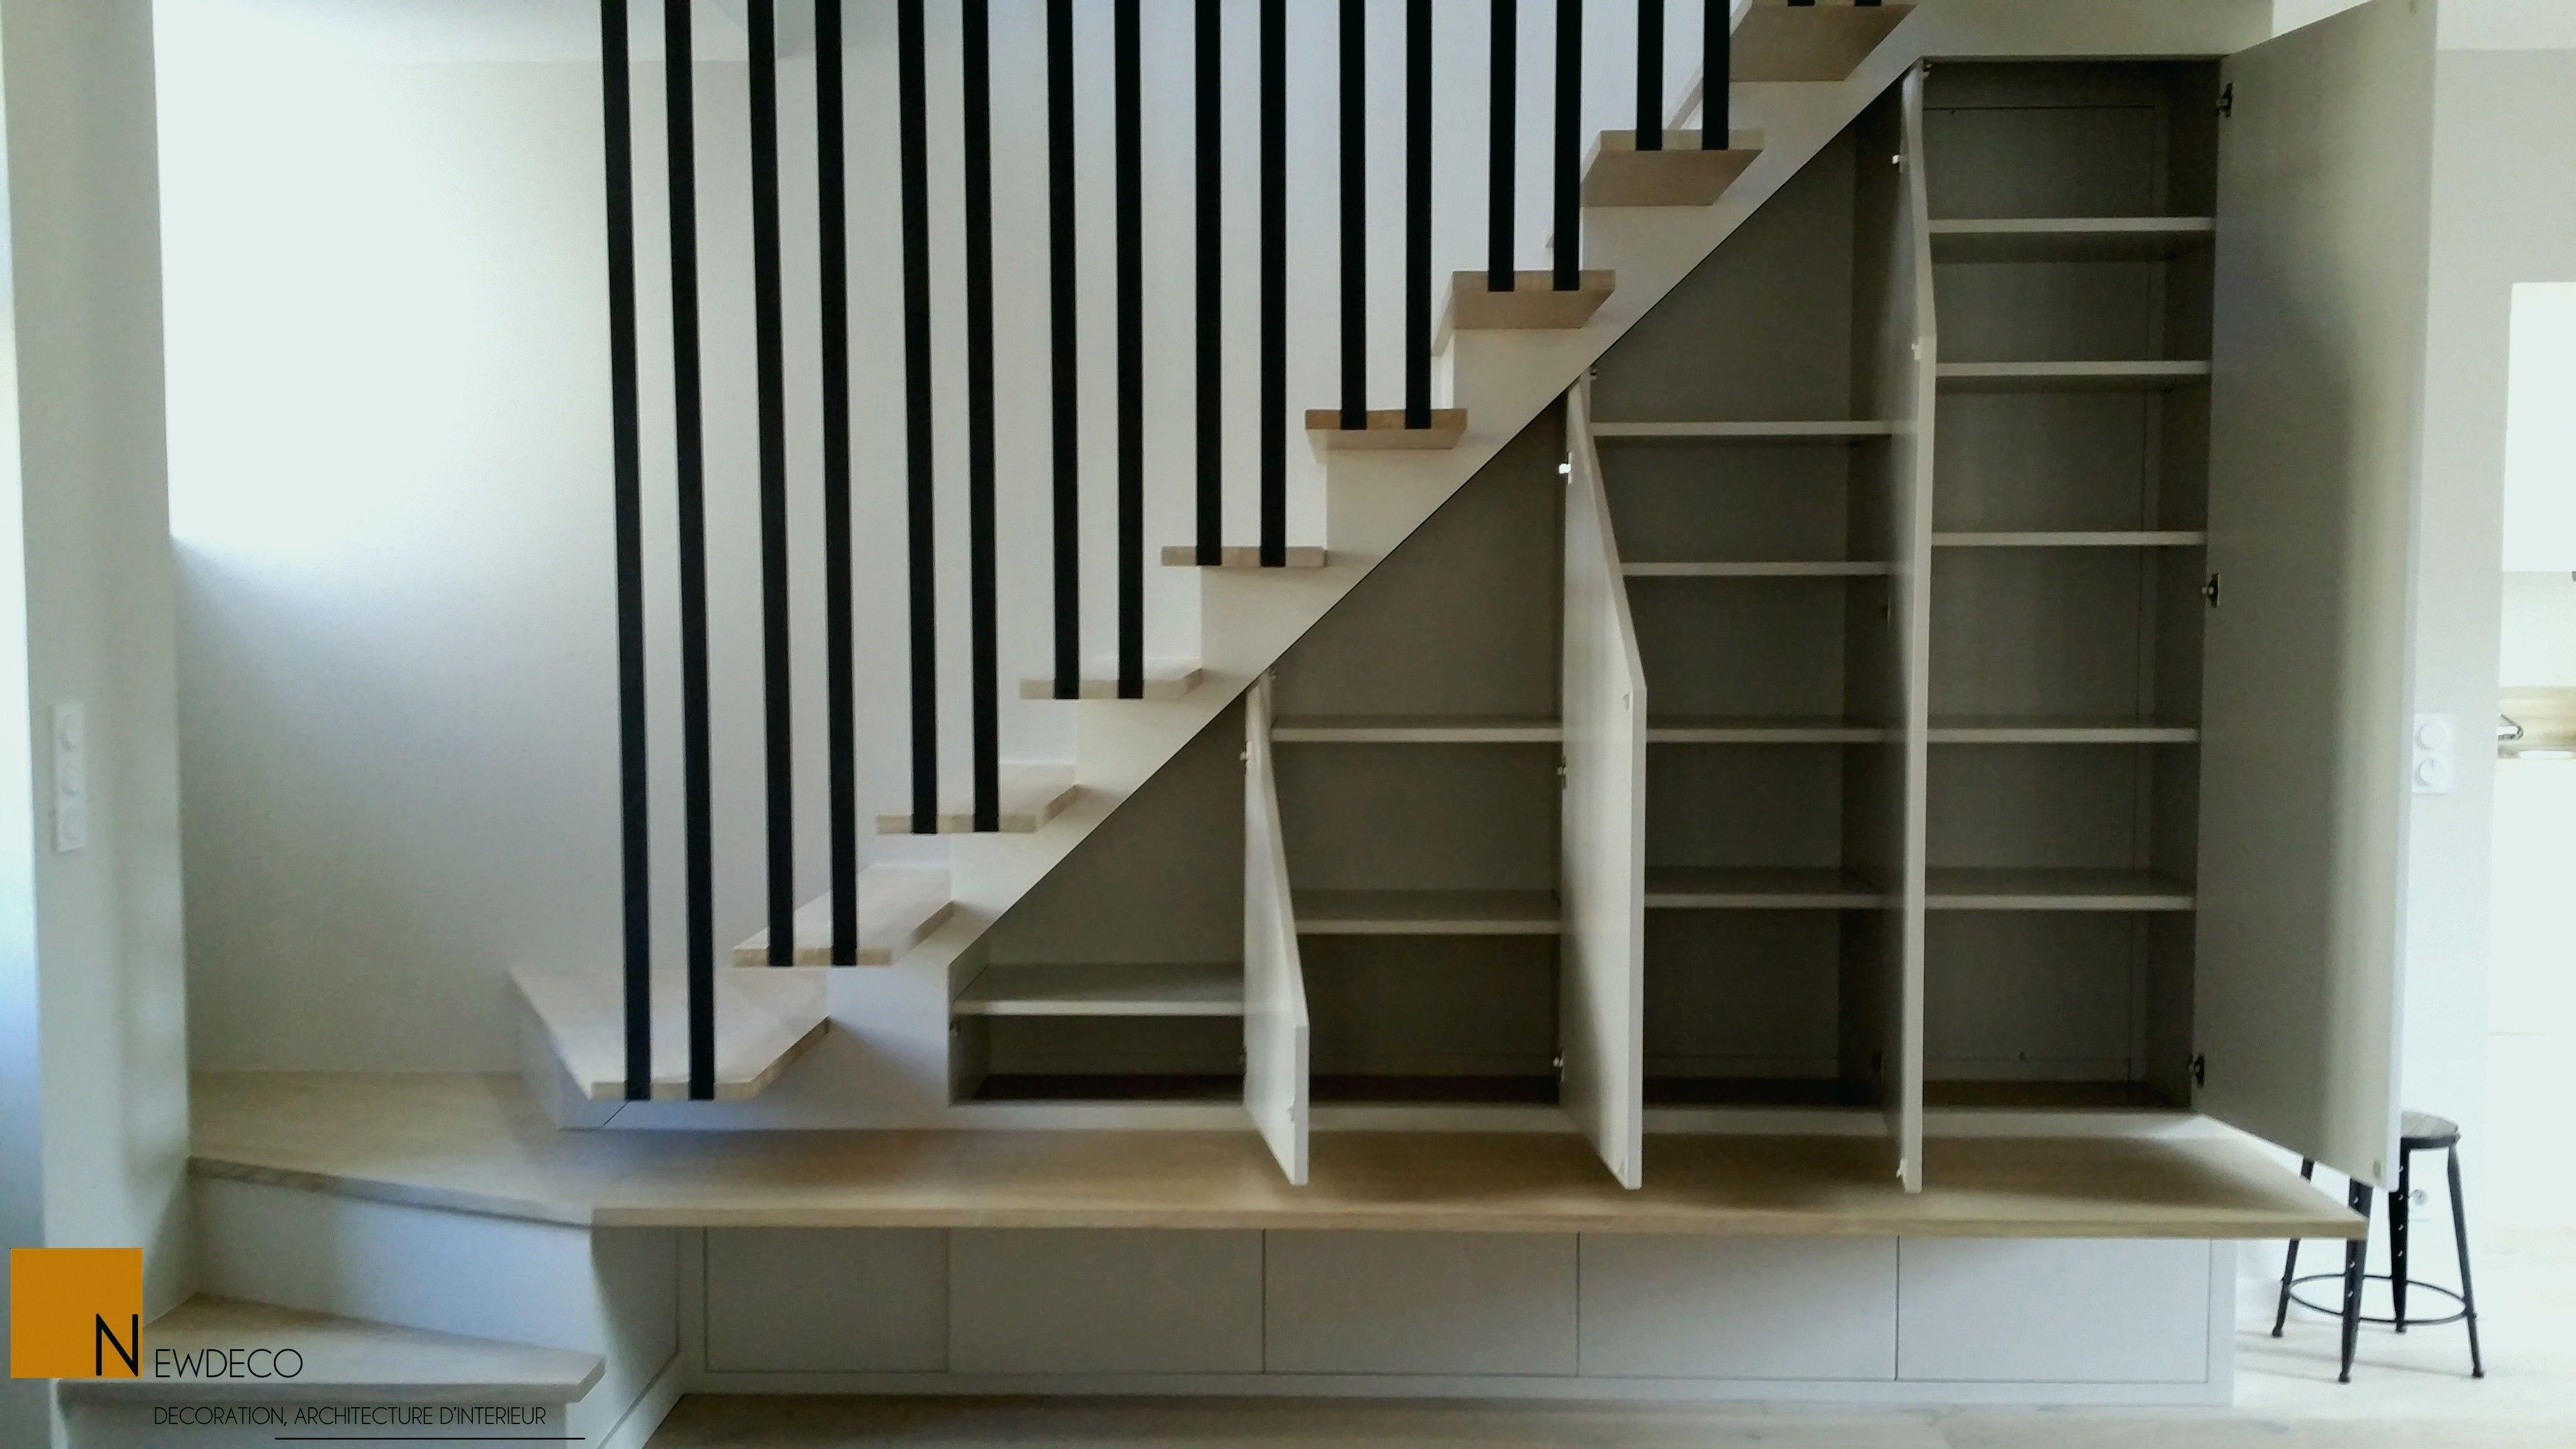 Garde Corps Haut Escalier hauteur garde corps escalier luxe escalier maison id es d